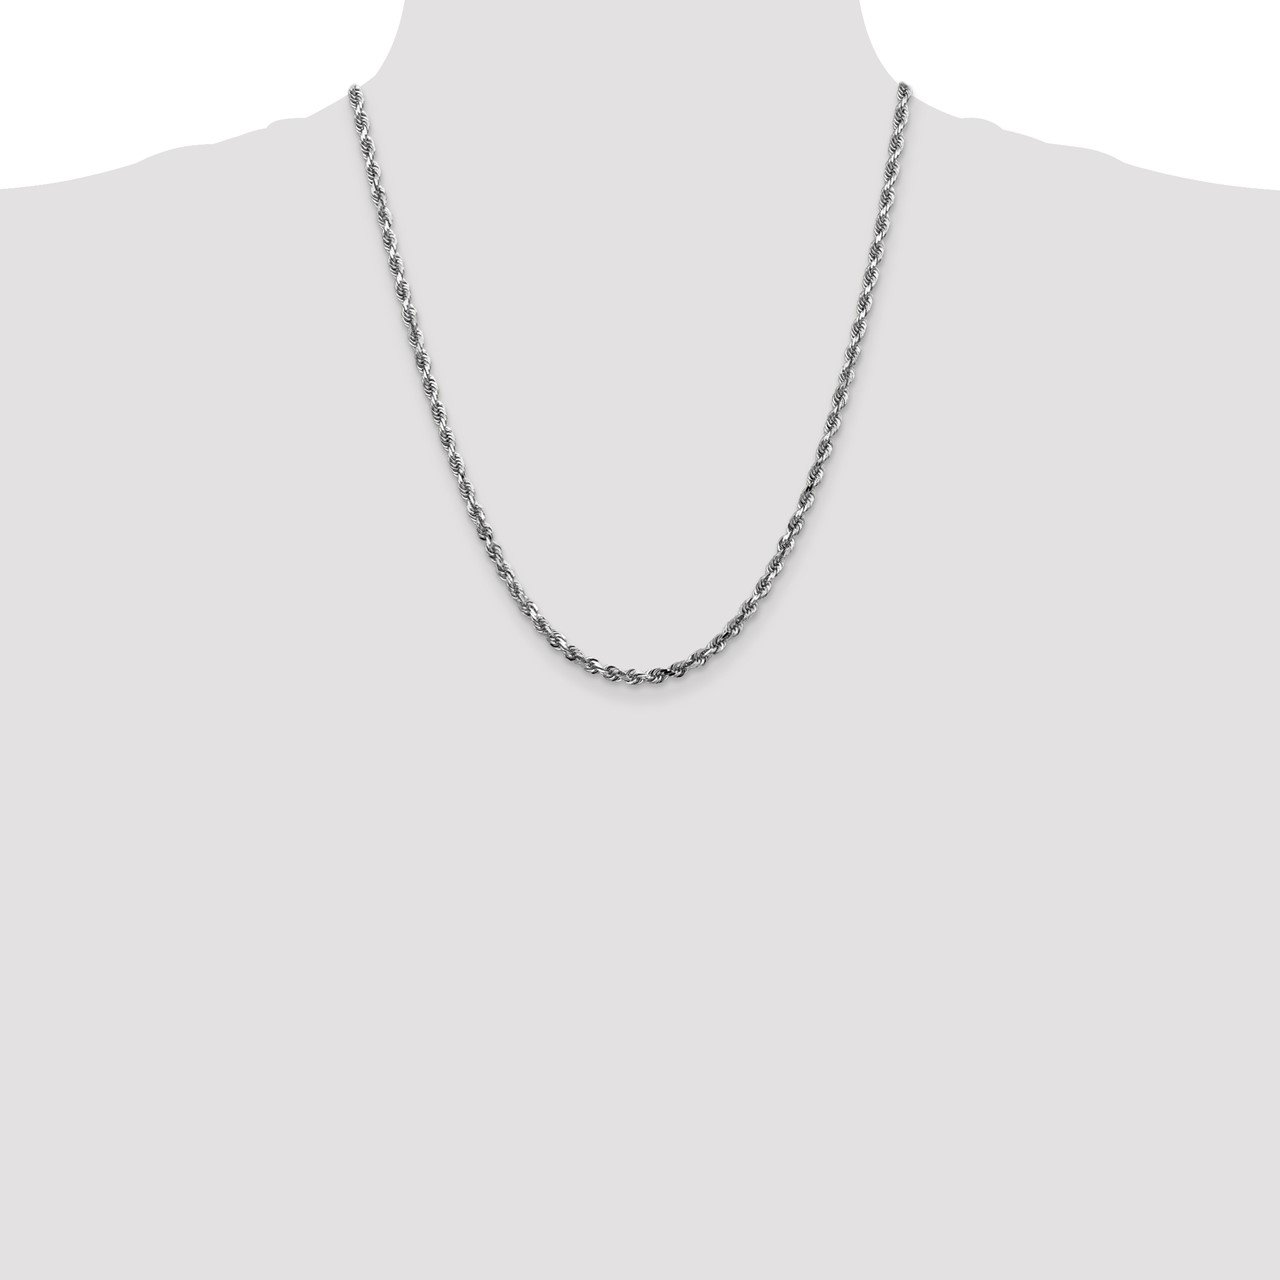 14k White Gold 4mm D/C Quadruple Rope Chain-1